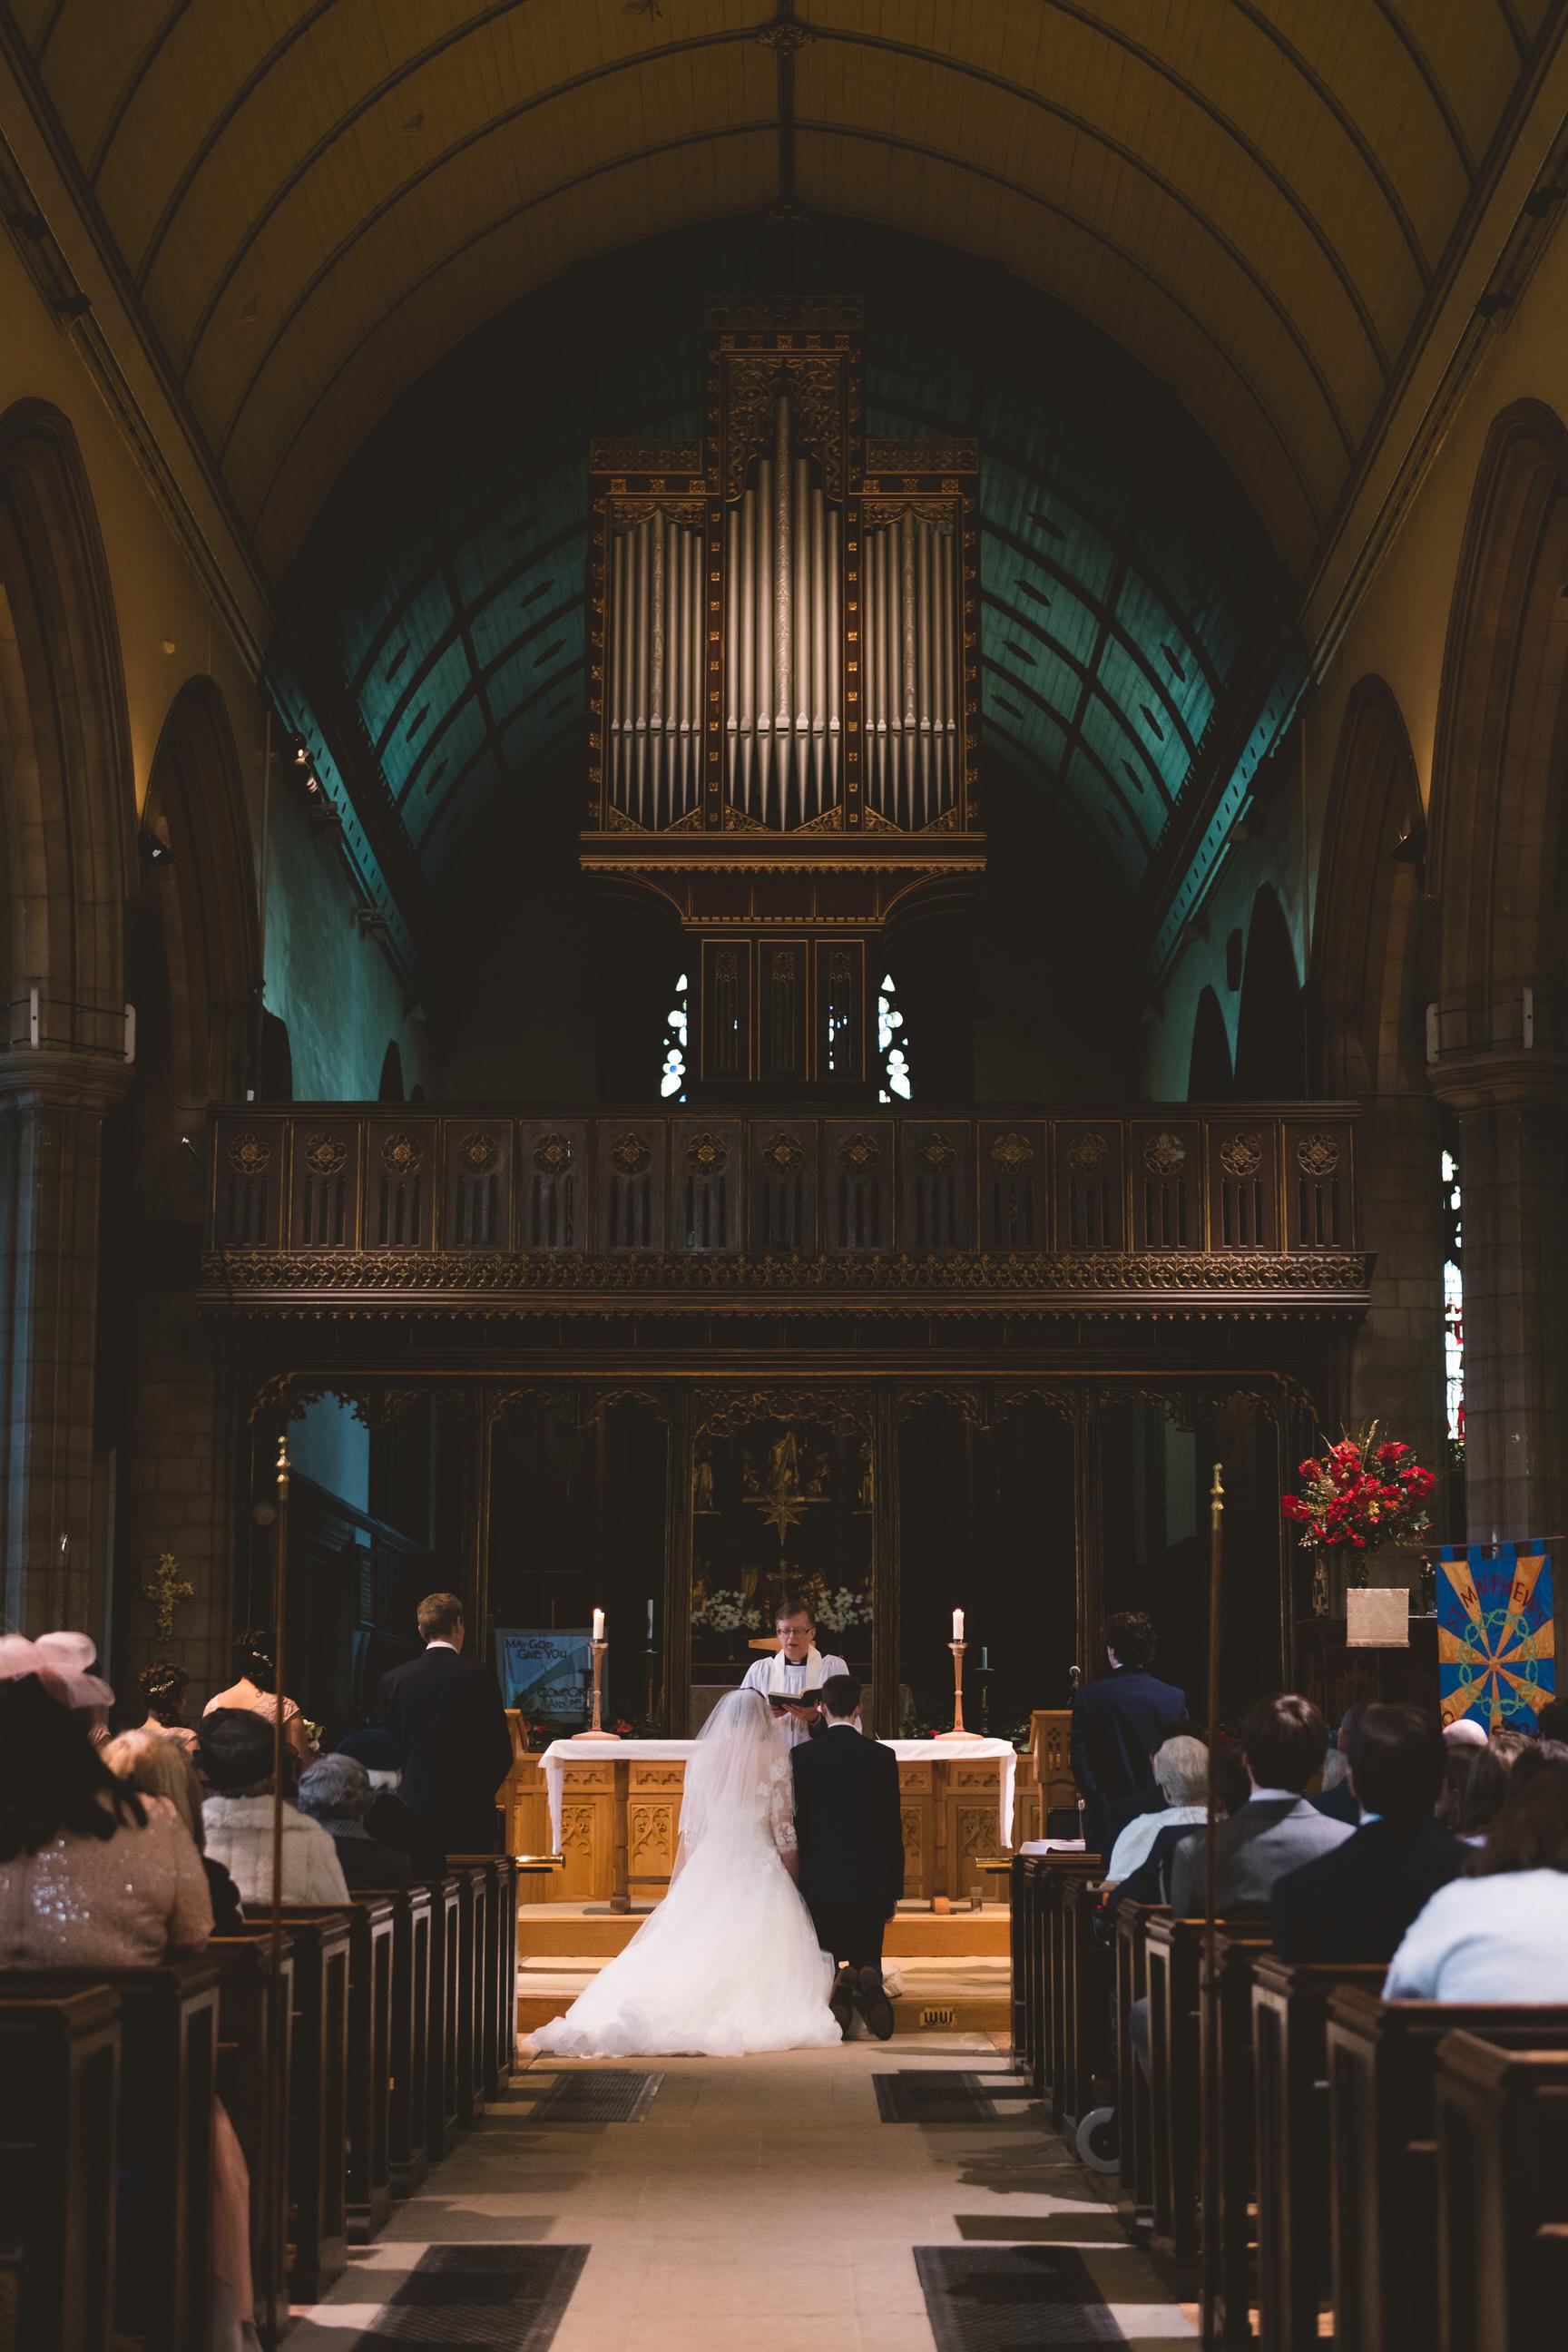 The-Old-Swan-Hotel-Harrogate-Wedding-Photographer-2.jpg